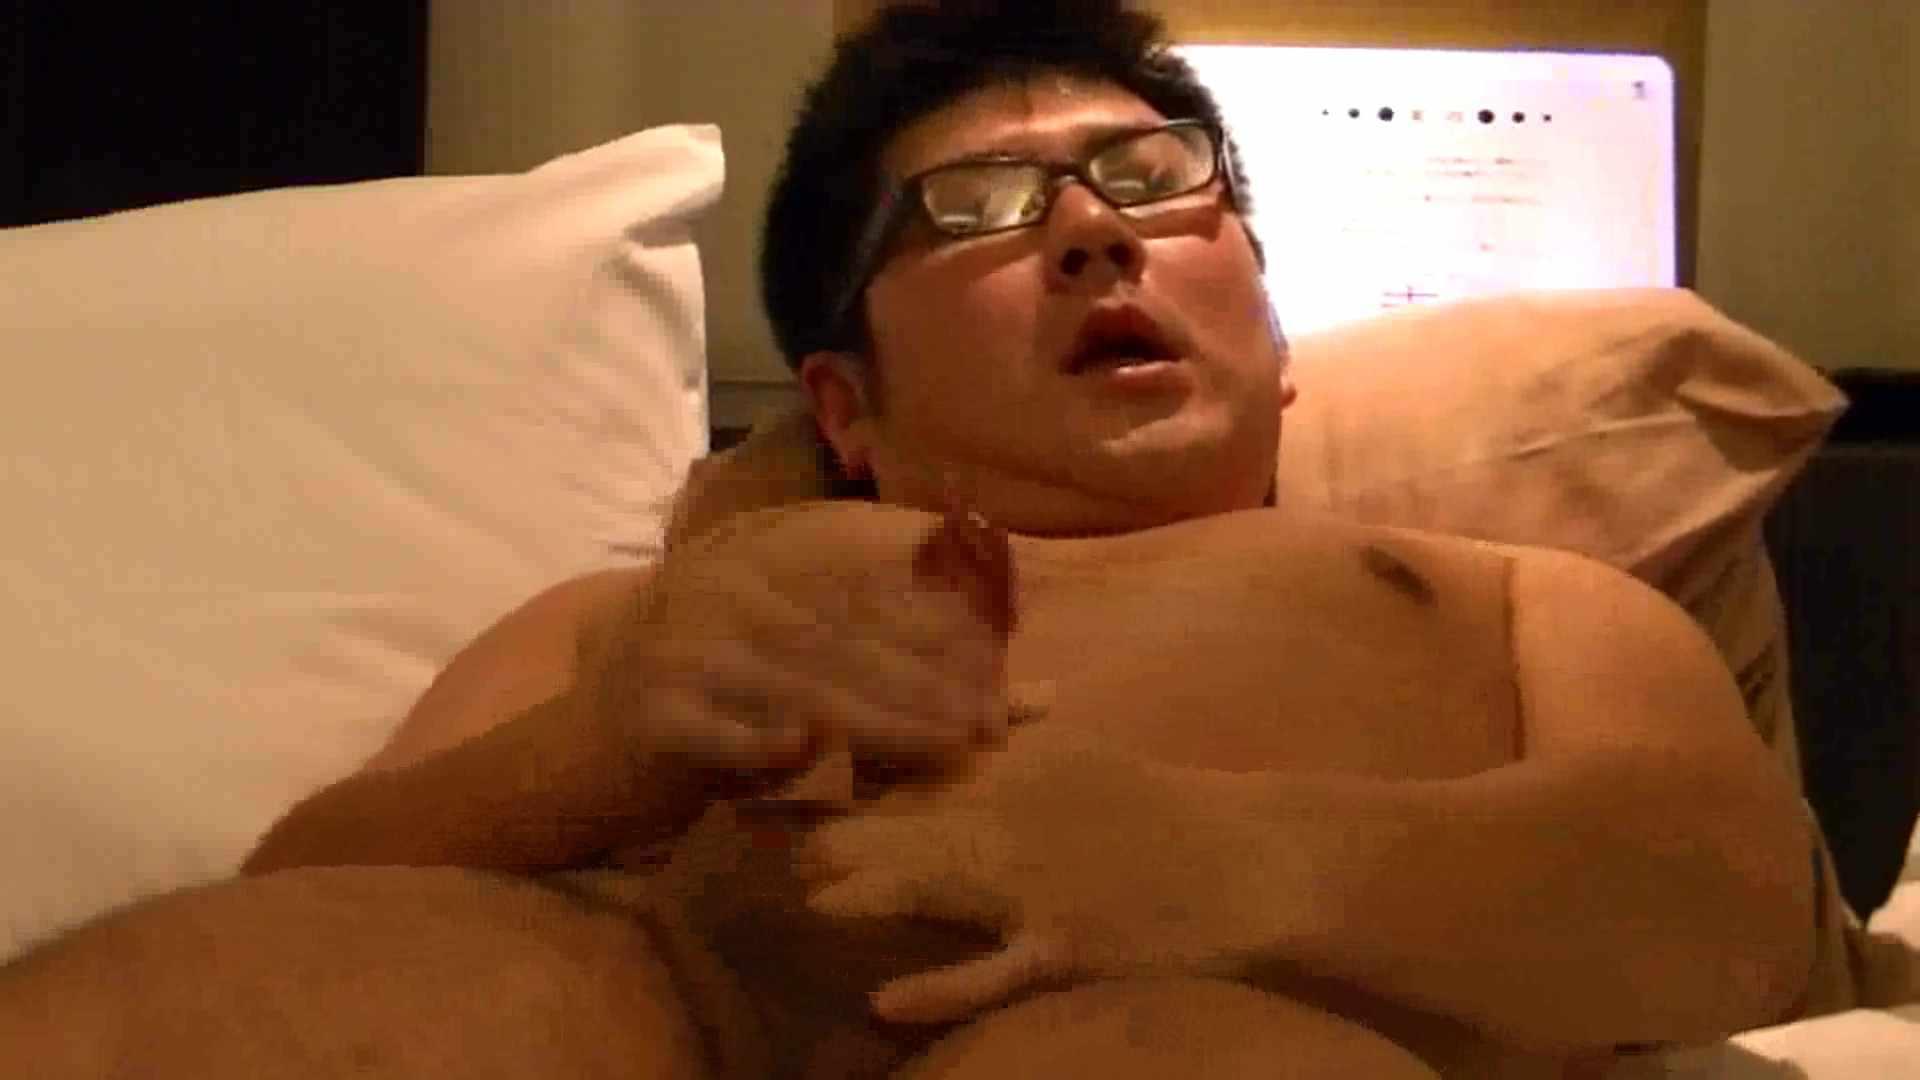 ONA見せカーニバル!! Vol5 エッチ ゲイ無修正ビデオ画像 108枚 108